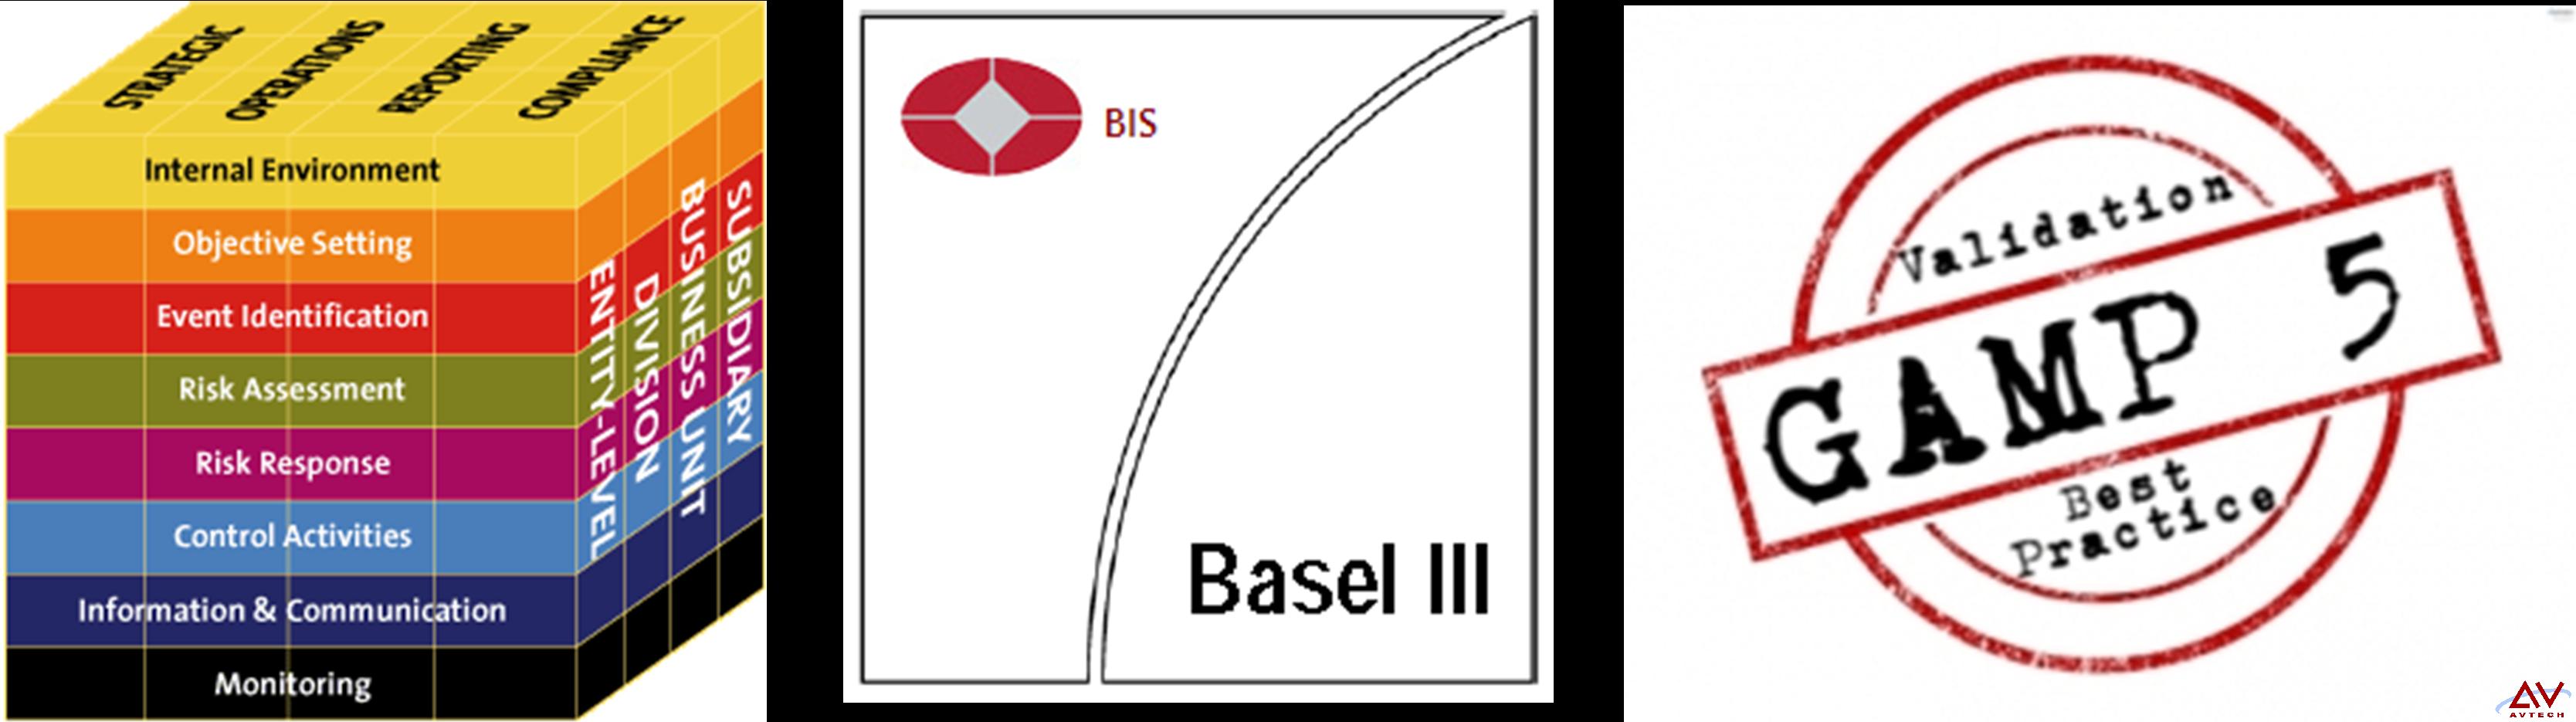 CRISC认证和CISA认证/CISM认证的区别在哪里